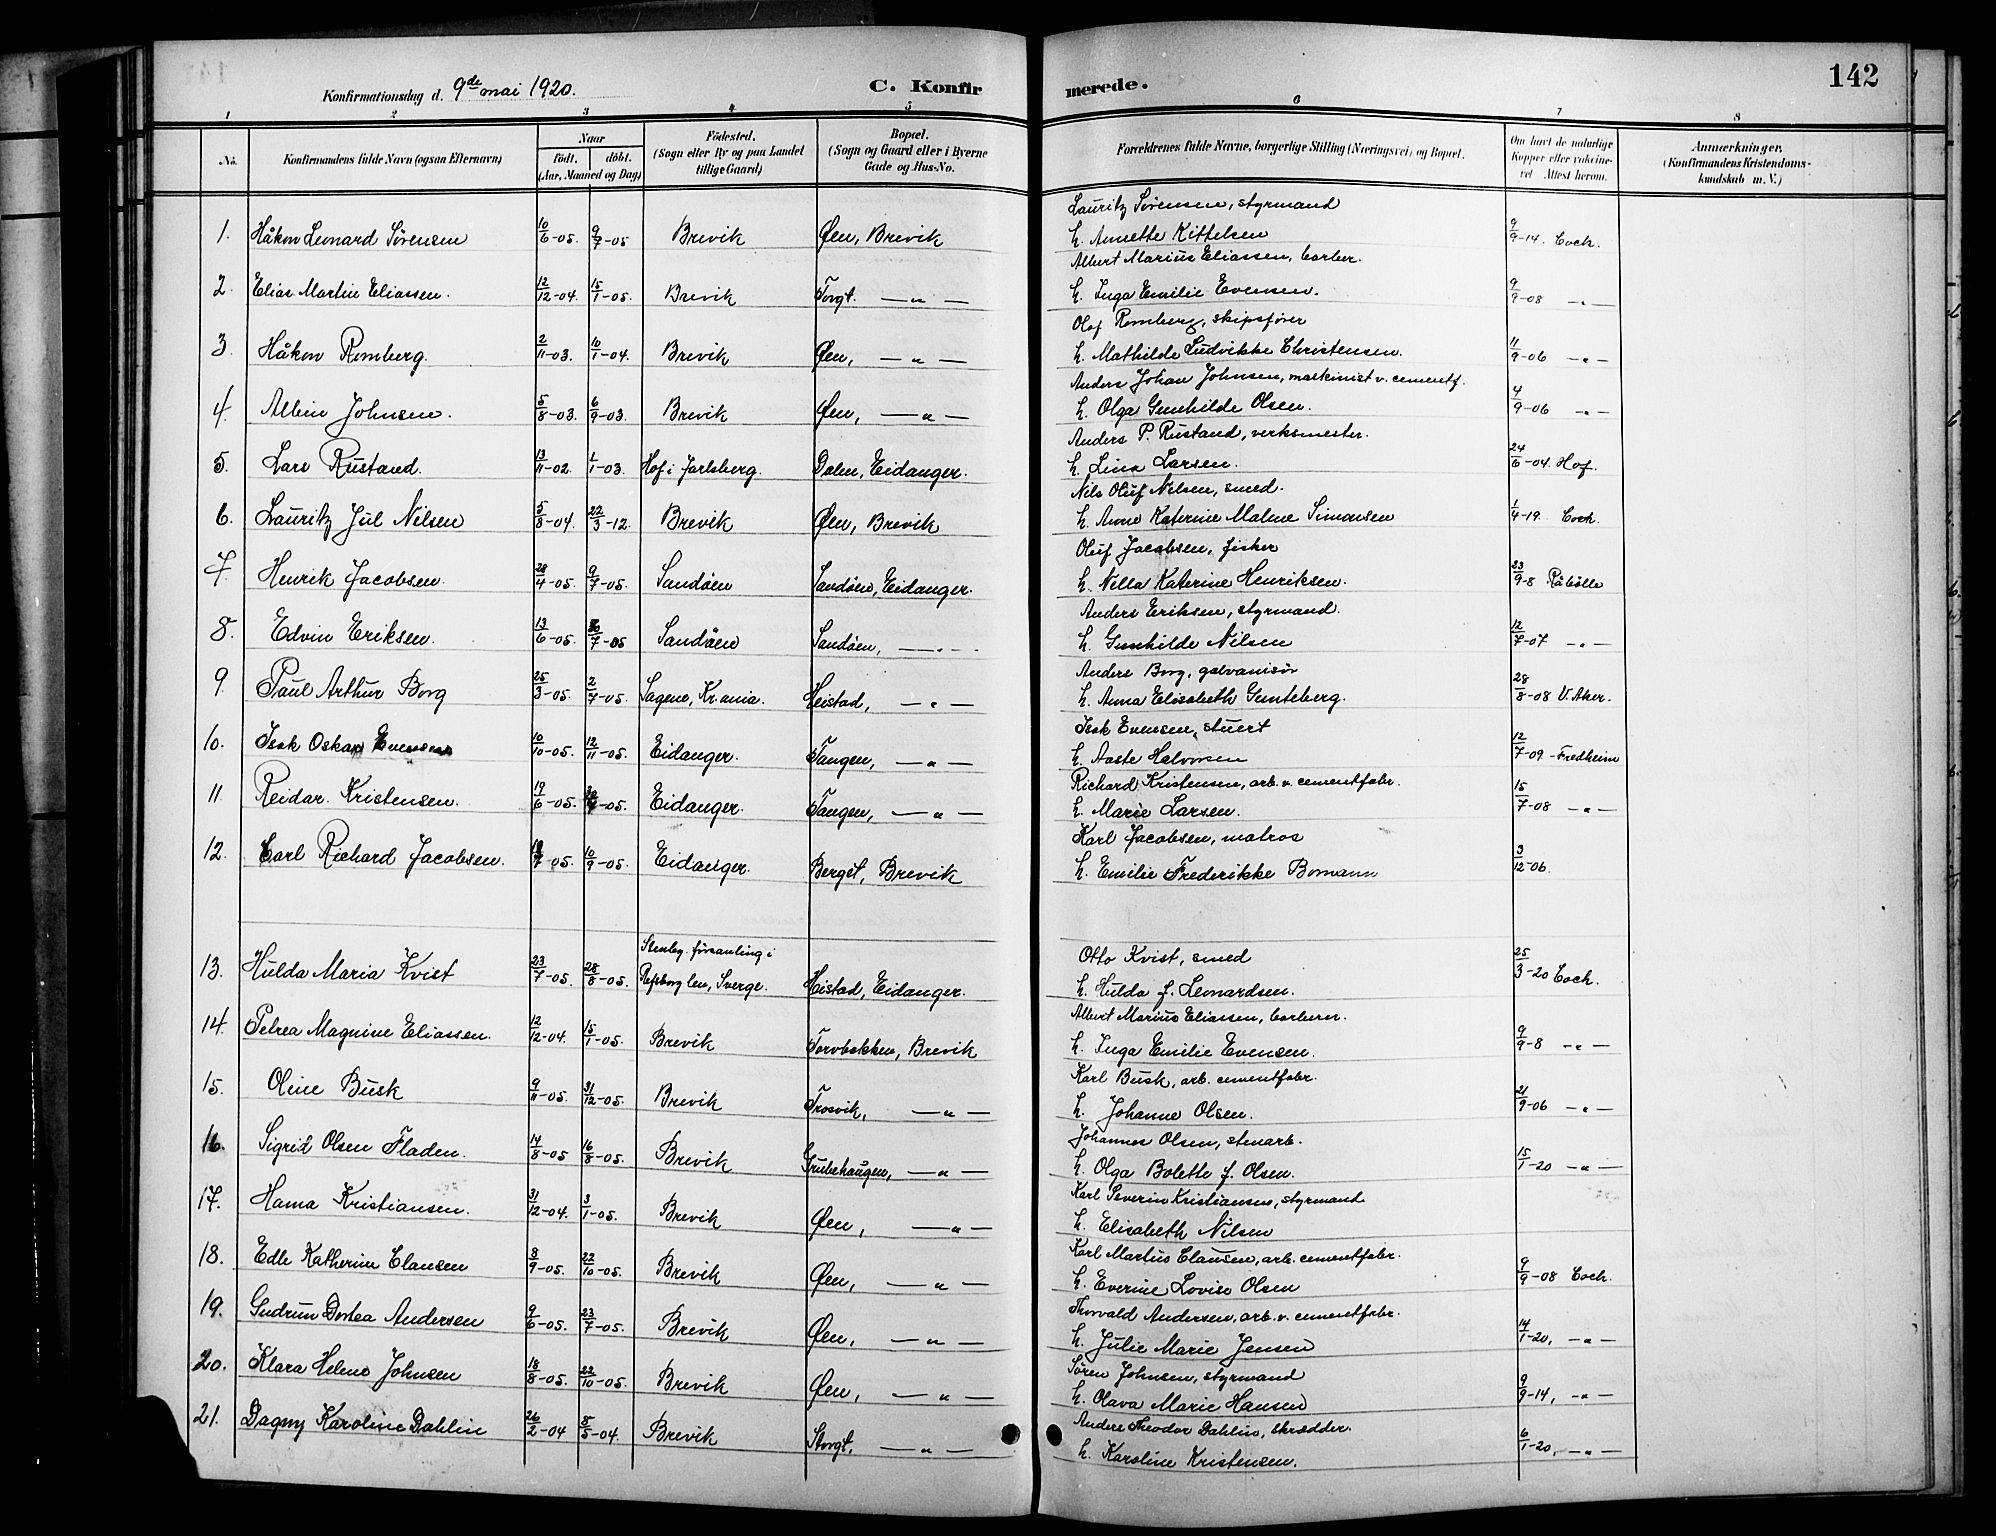 SAKO, Brevik kirkebøker, G/Ga/L0005: Klokkerbok nr. 5, 1901-1924, s. 142